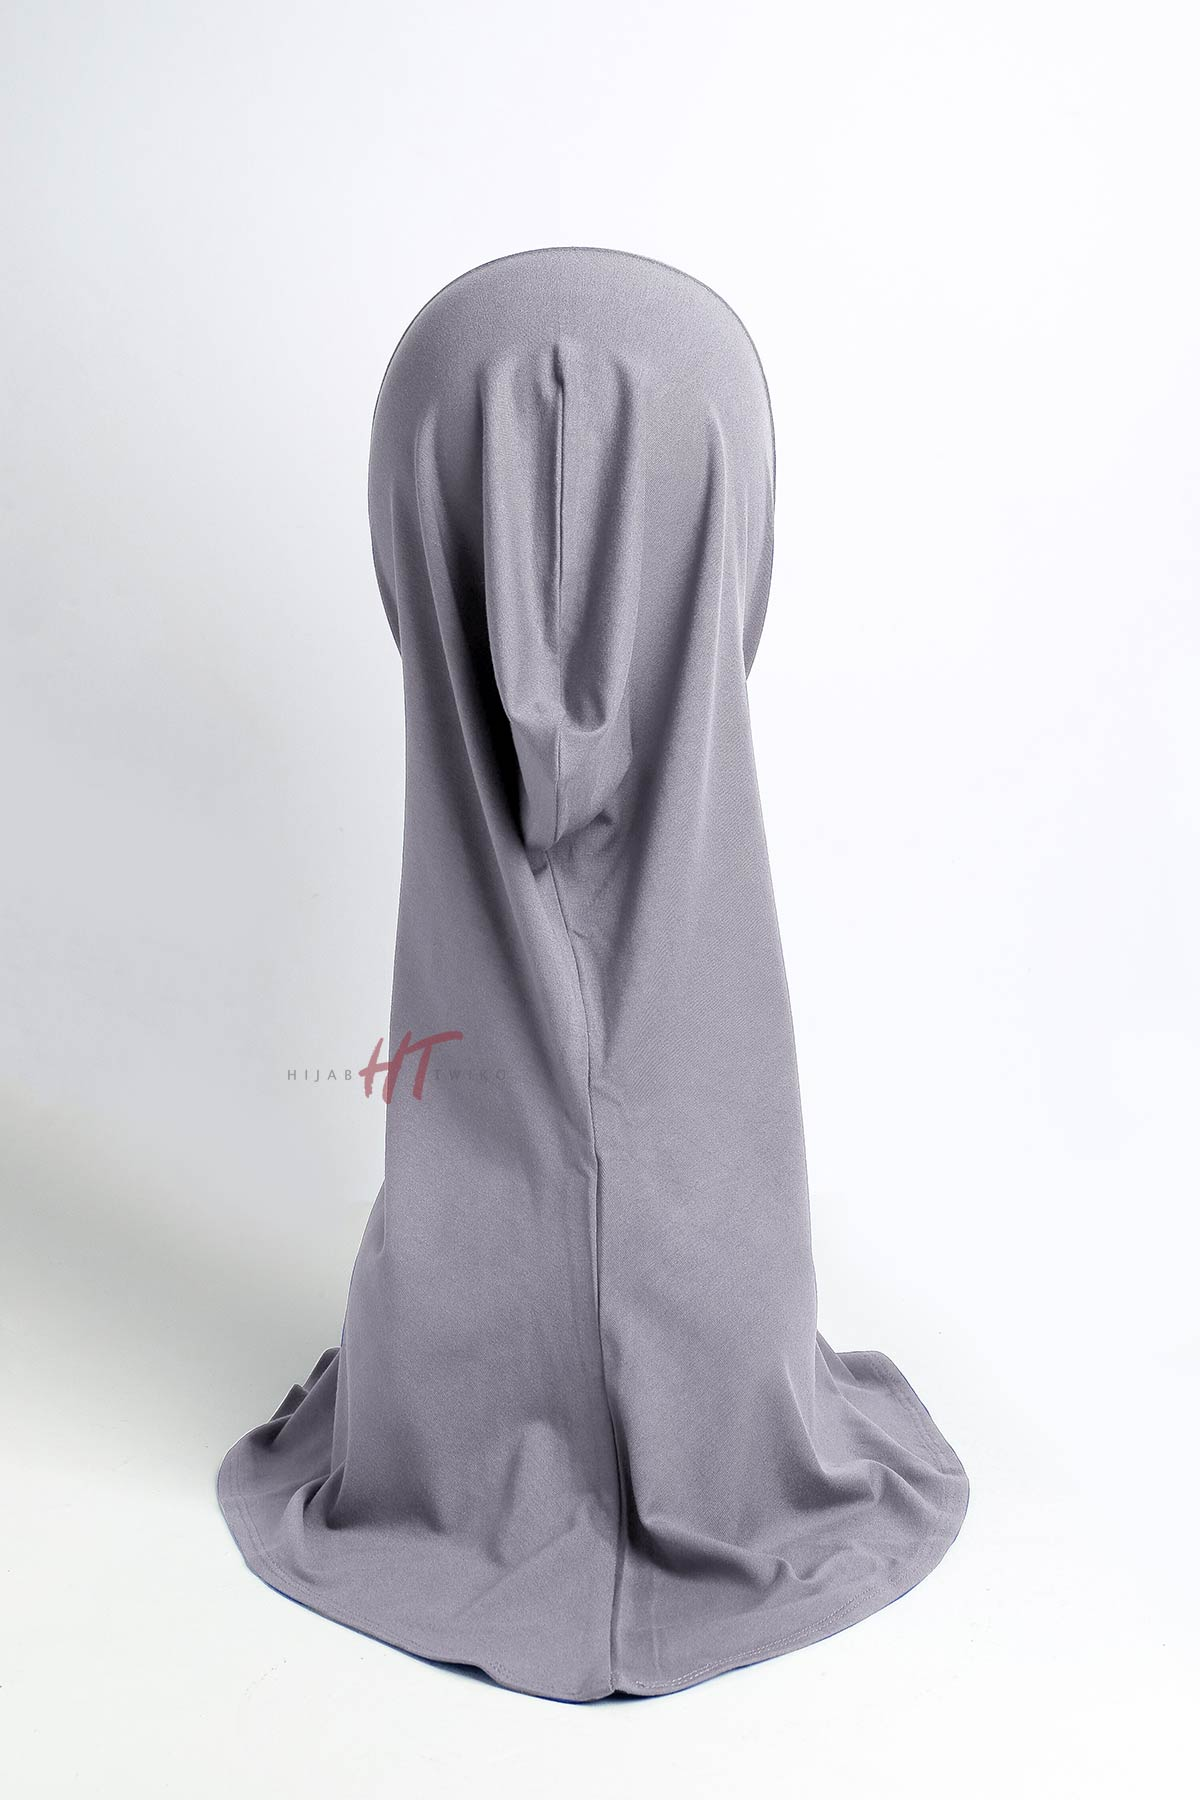 Ninja-Antem-Stone-Grey-3